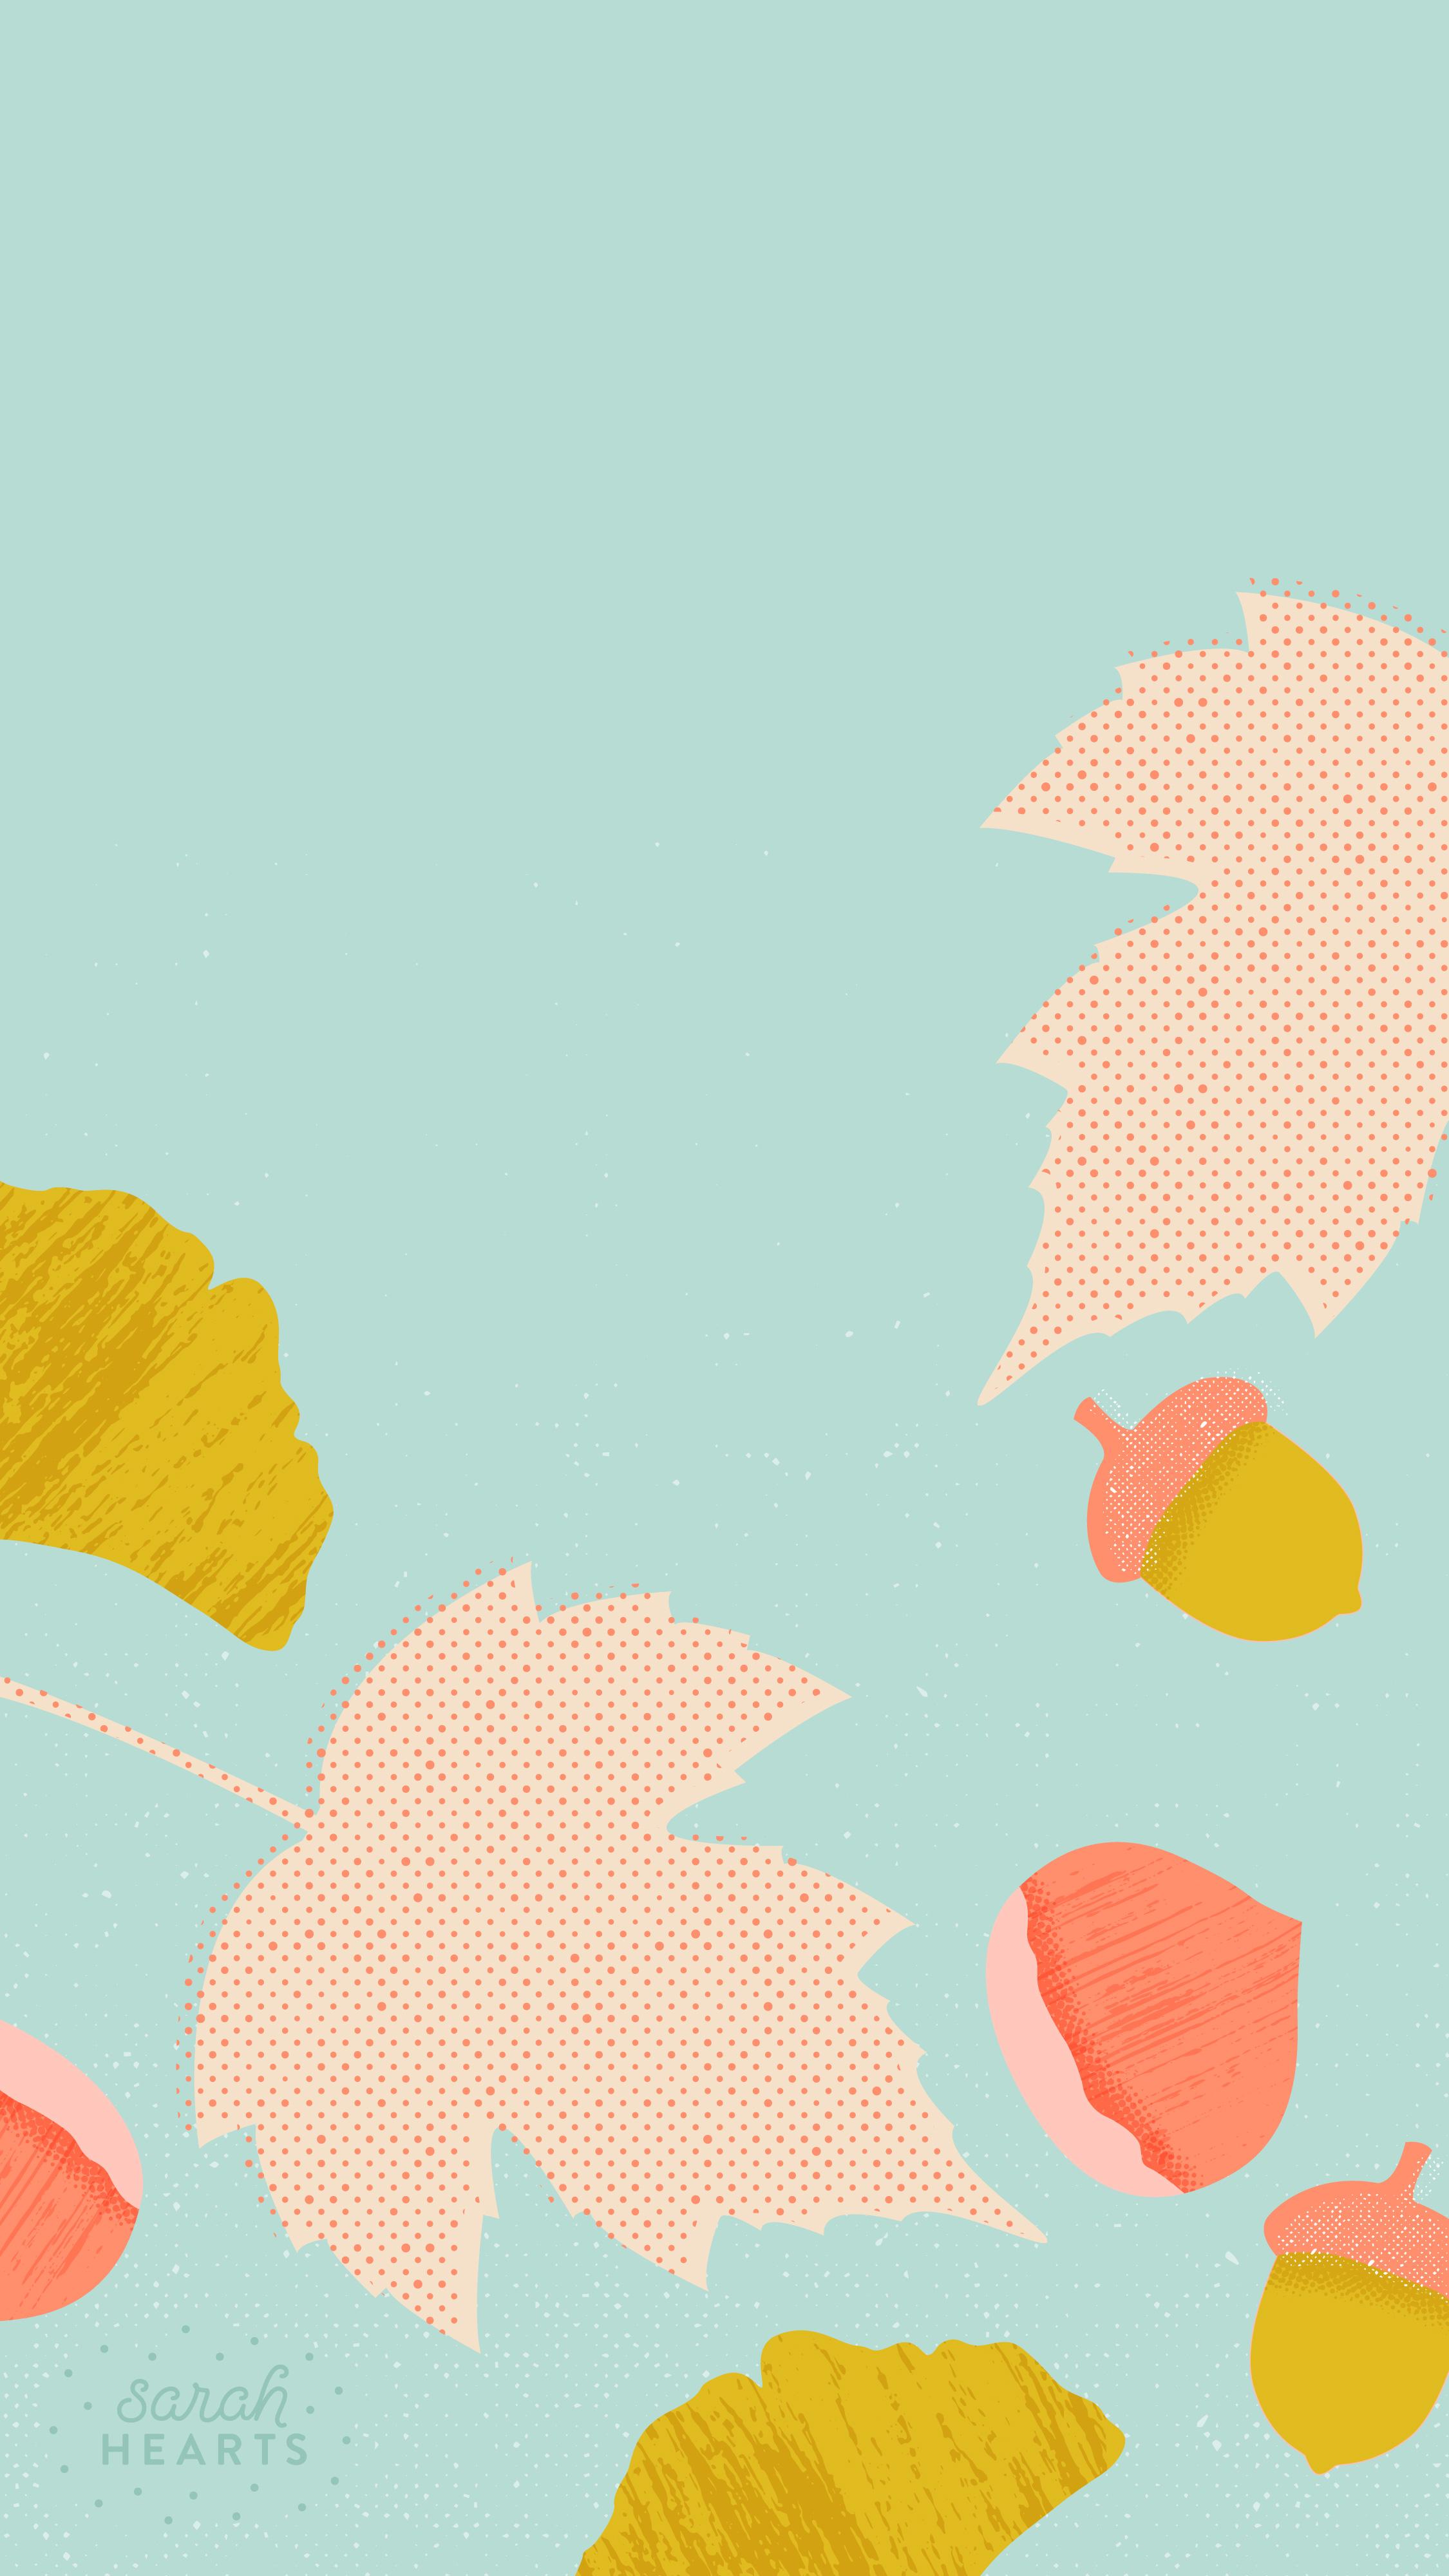 Pretty Fall Iphone Wallpaper October 2015 Calendar Wallpaper Sarah Hearts